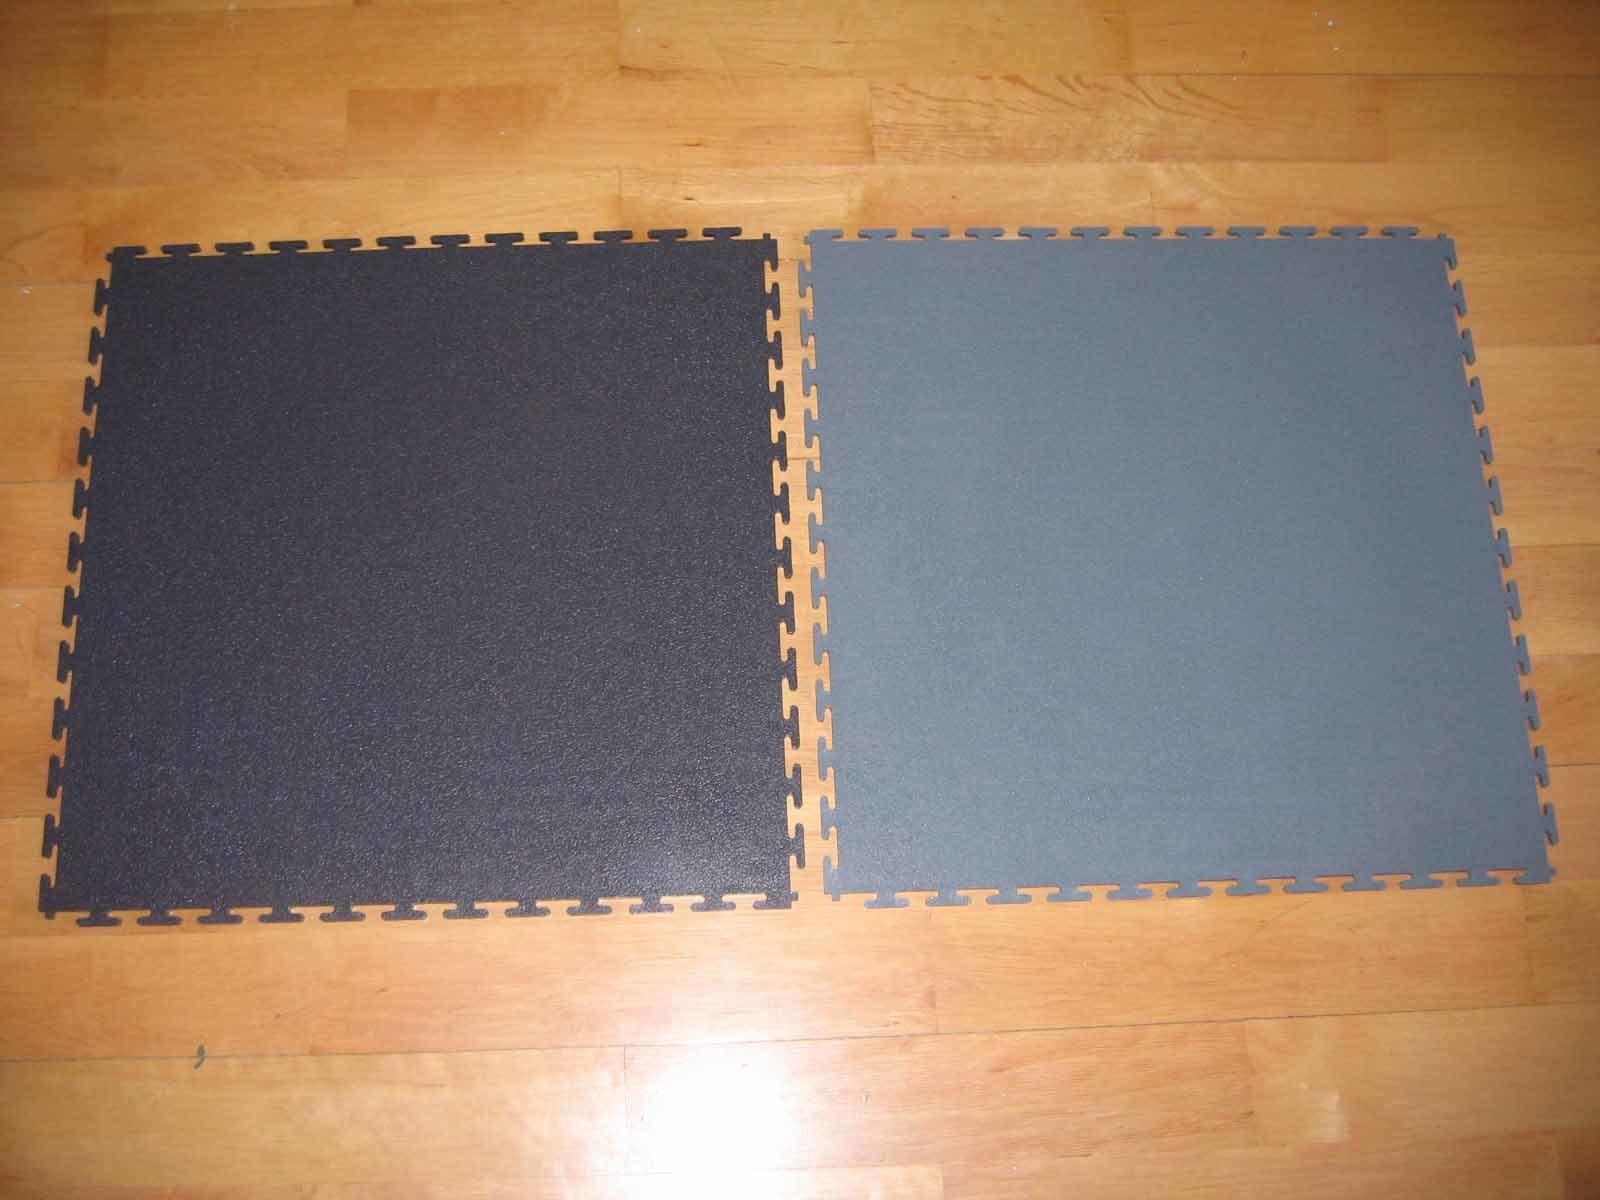 PVC Interlocking Gym Floor 500 x 500 x 7mm